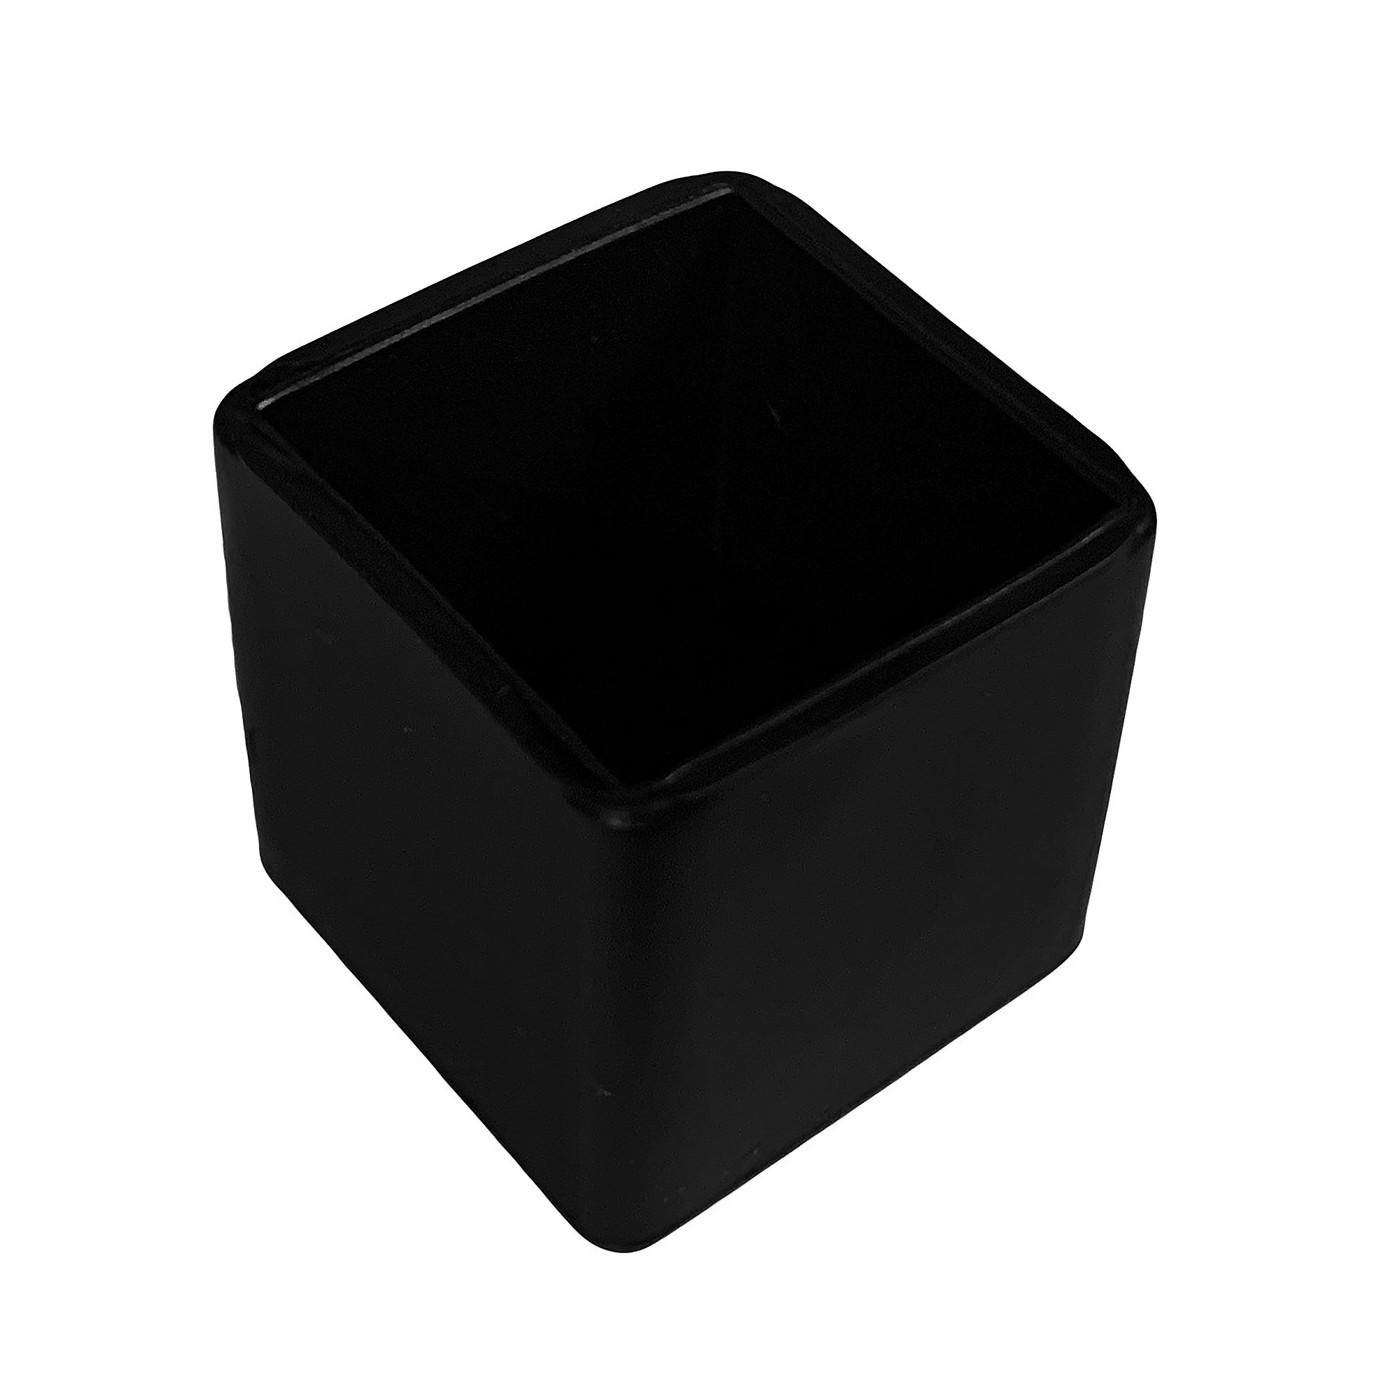 Juego de 32 tapas de silicona para patas de sillas (exteriores, cuadradas, 25 mm, negras) [O-SQ-25-B]  - 1